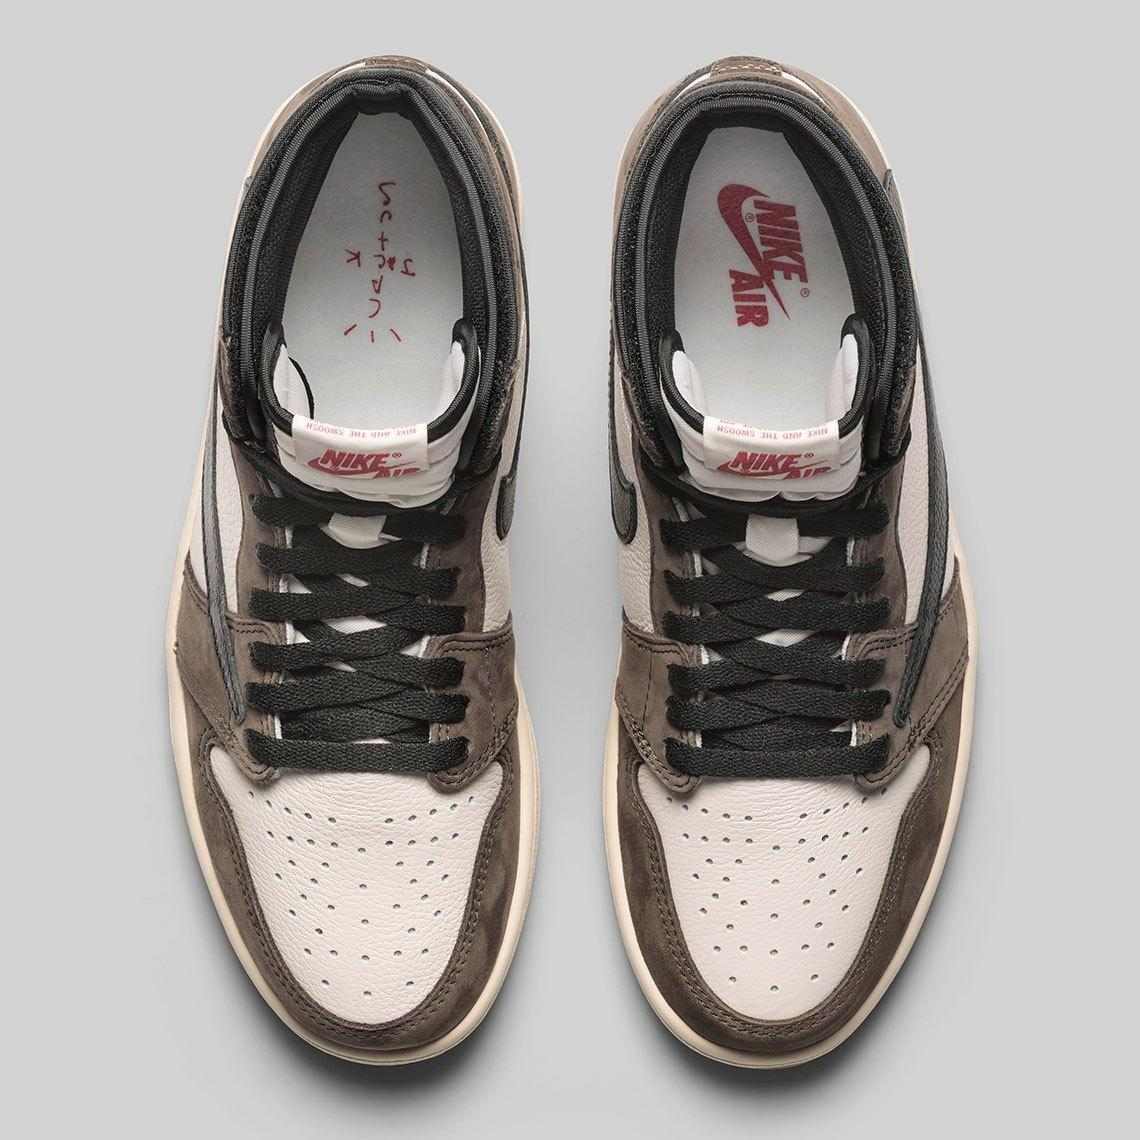 """Travis Scott x Air Jordan 1 High"" รองเท้าสุดแพงแถมยังหาซื้อยาก 03"